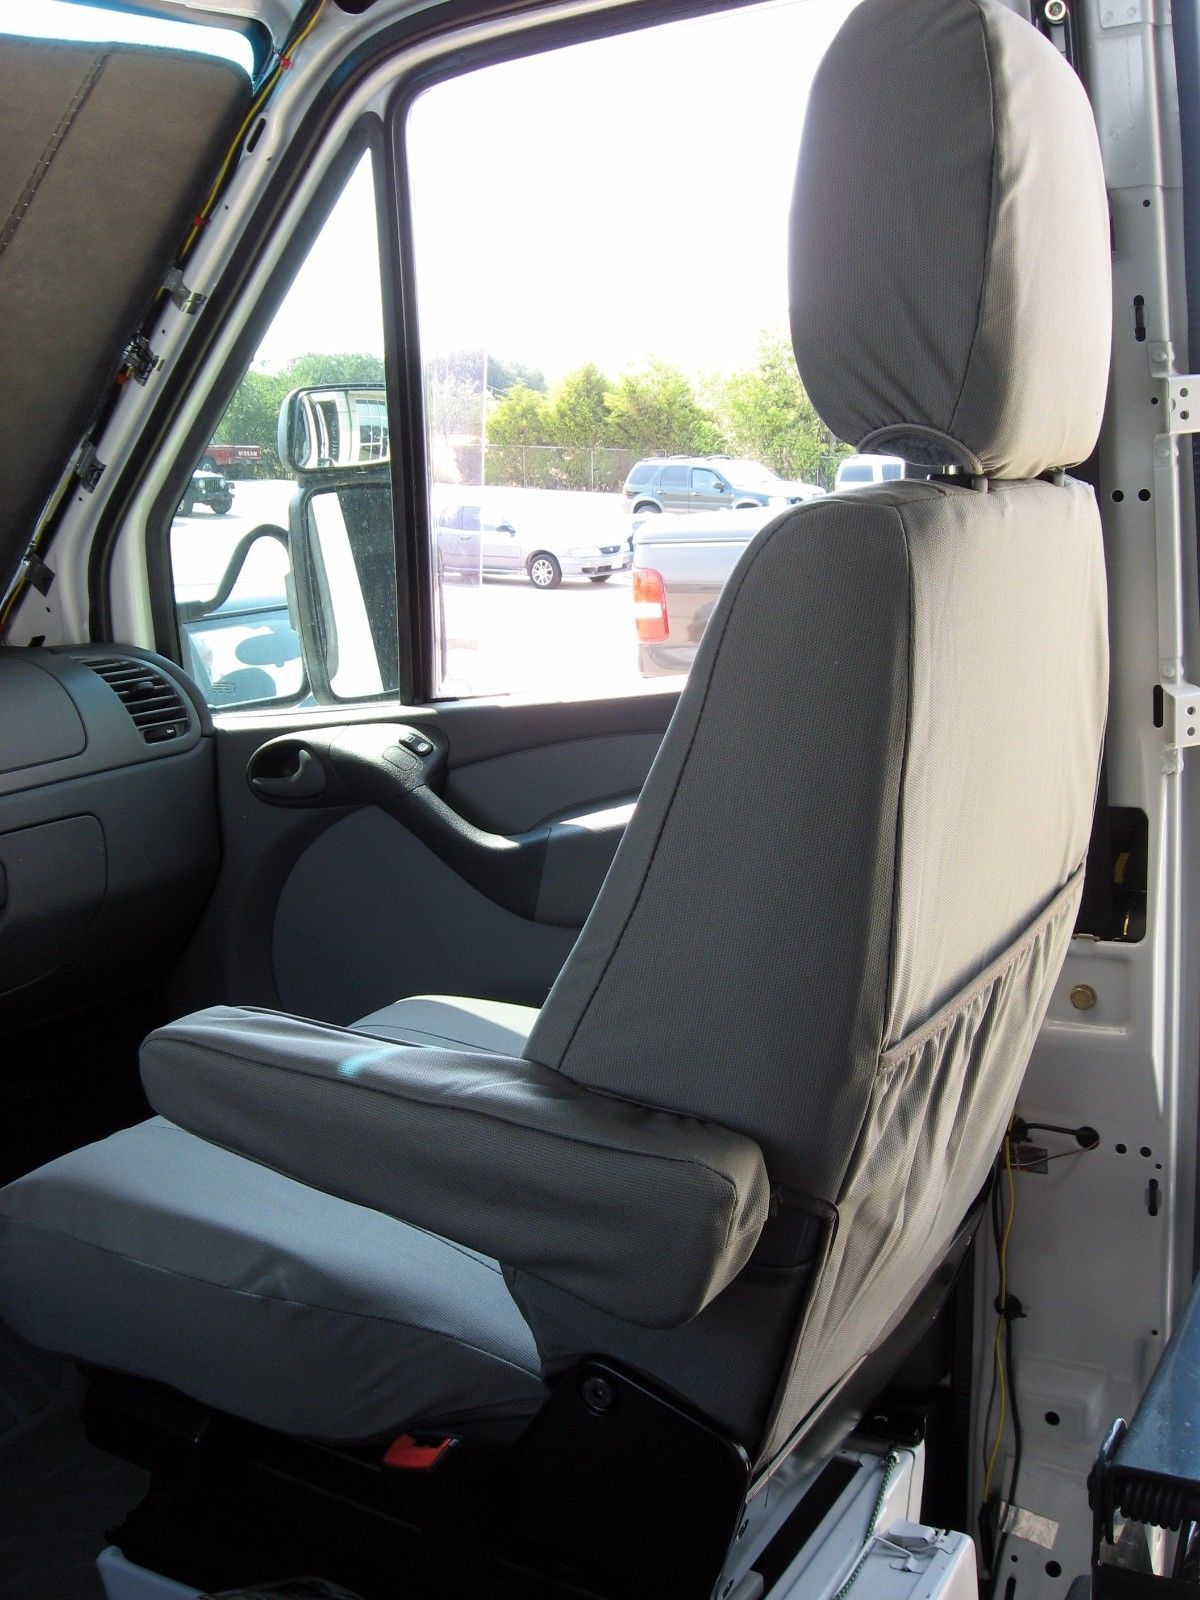 2002 2011 dodge sprinter passenger van front bucket seats waterproof seat covers seat covers. Black Bedroom Furniture Sets. Home Design Ideas